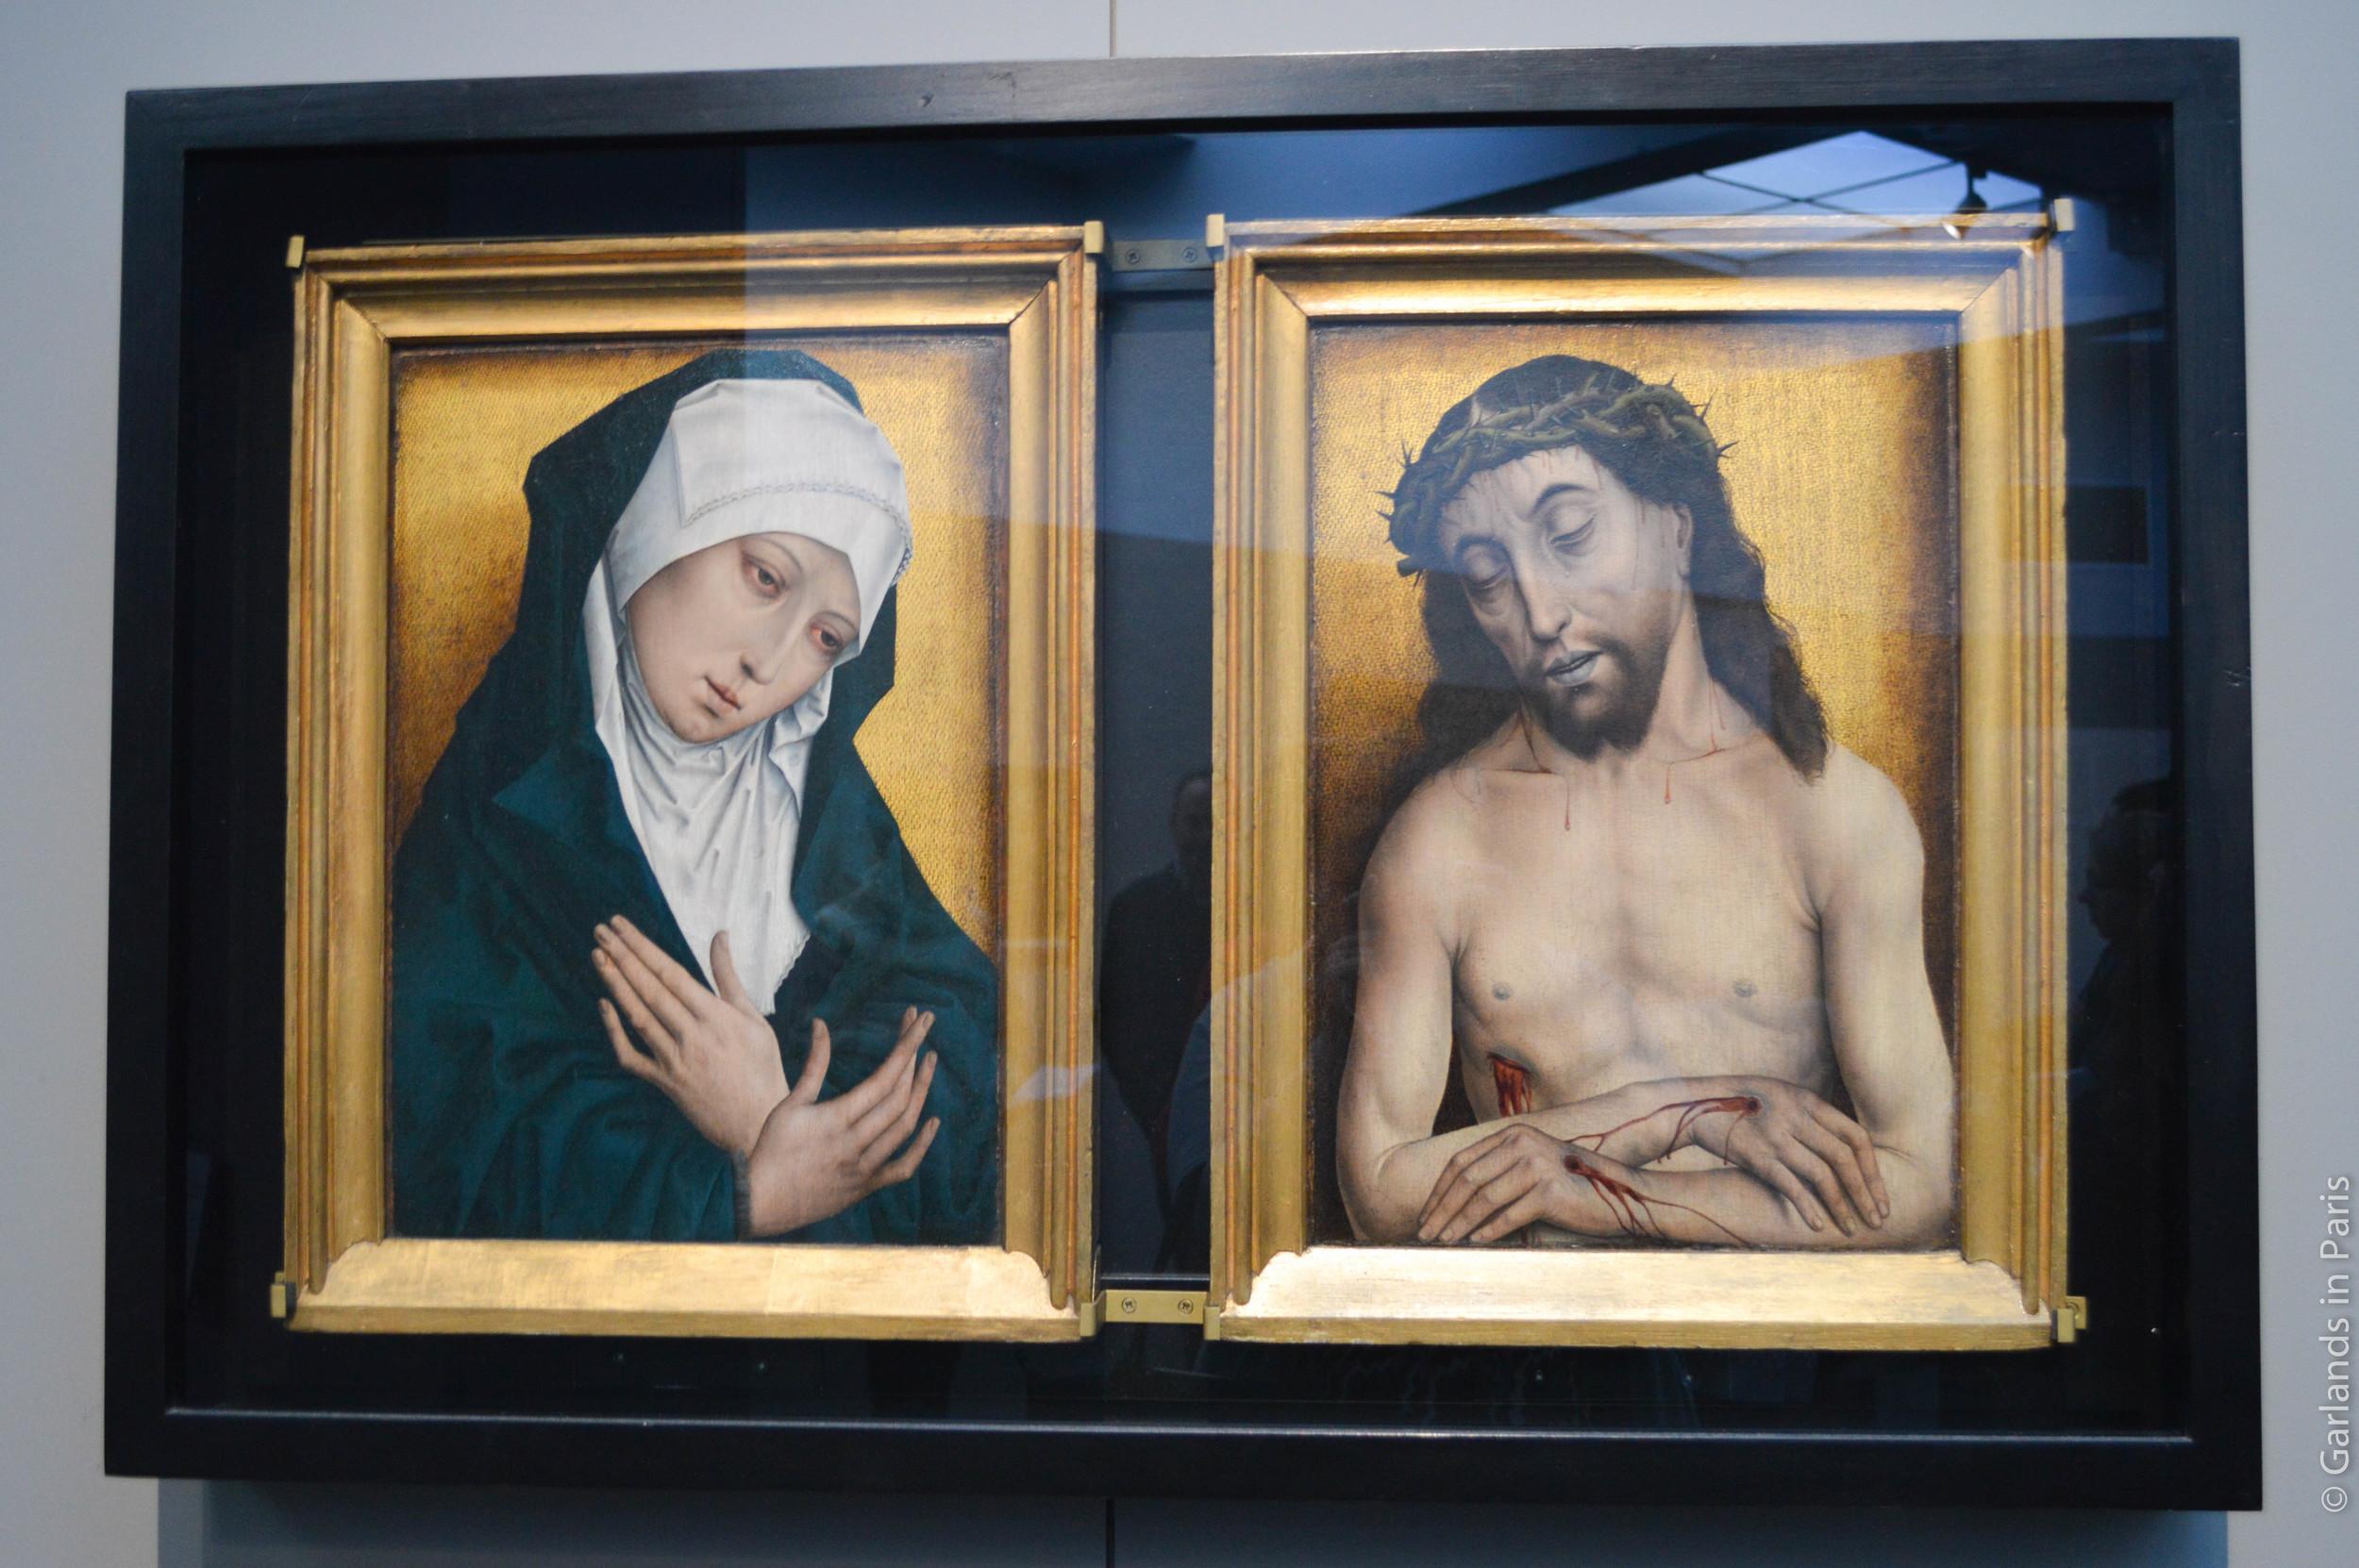 The Virgin and the Man of Sorrow, 1480-90, Simon Marmion